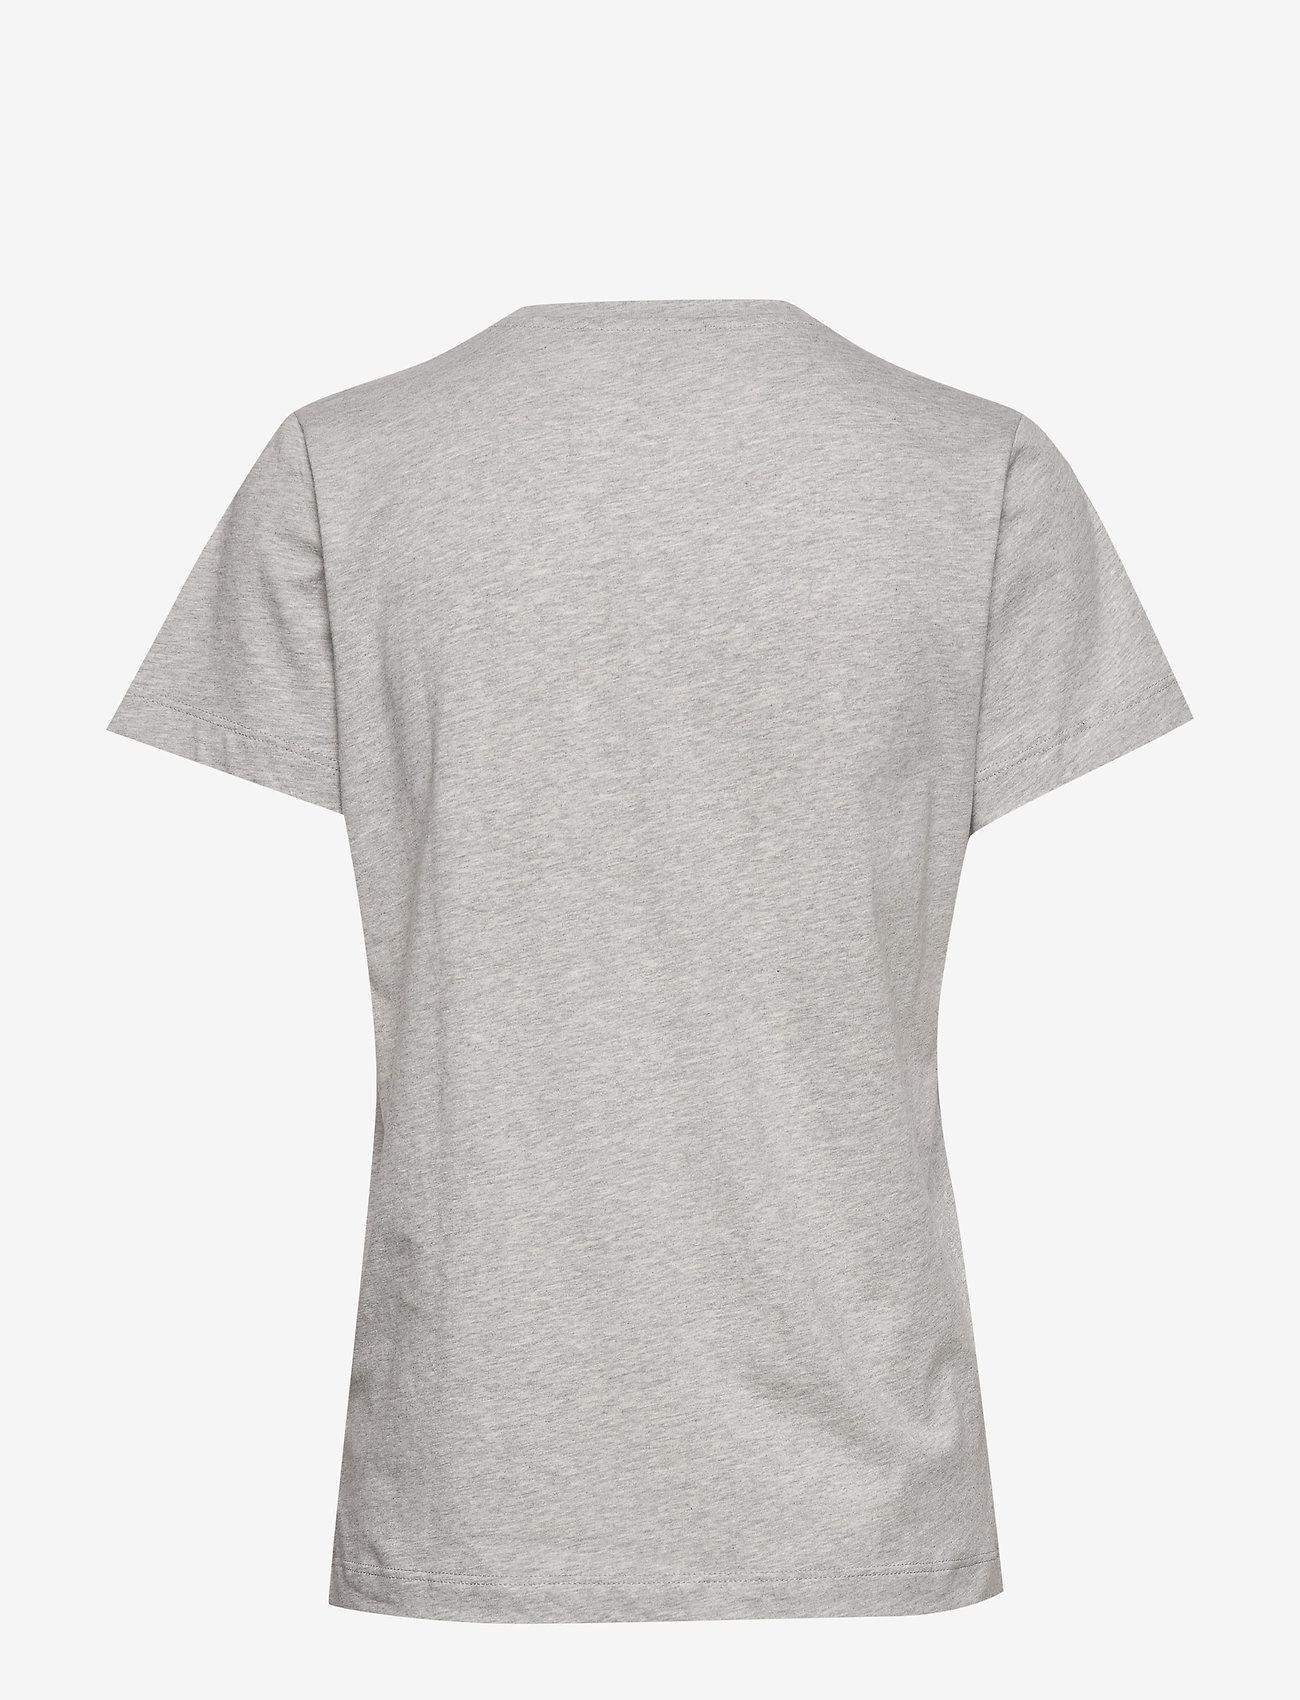 Munthe - Ulla - printti t-paidat - grey